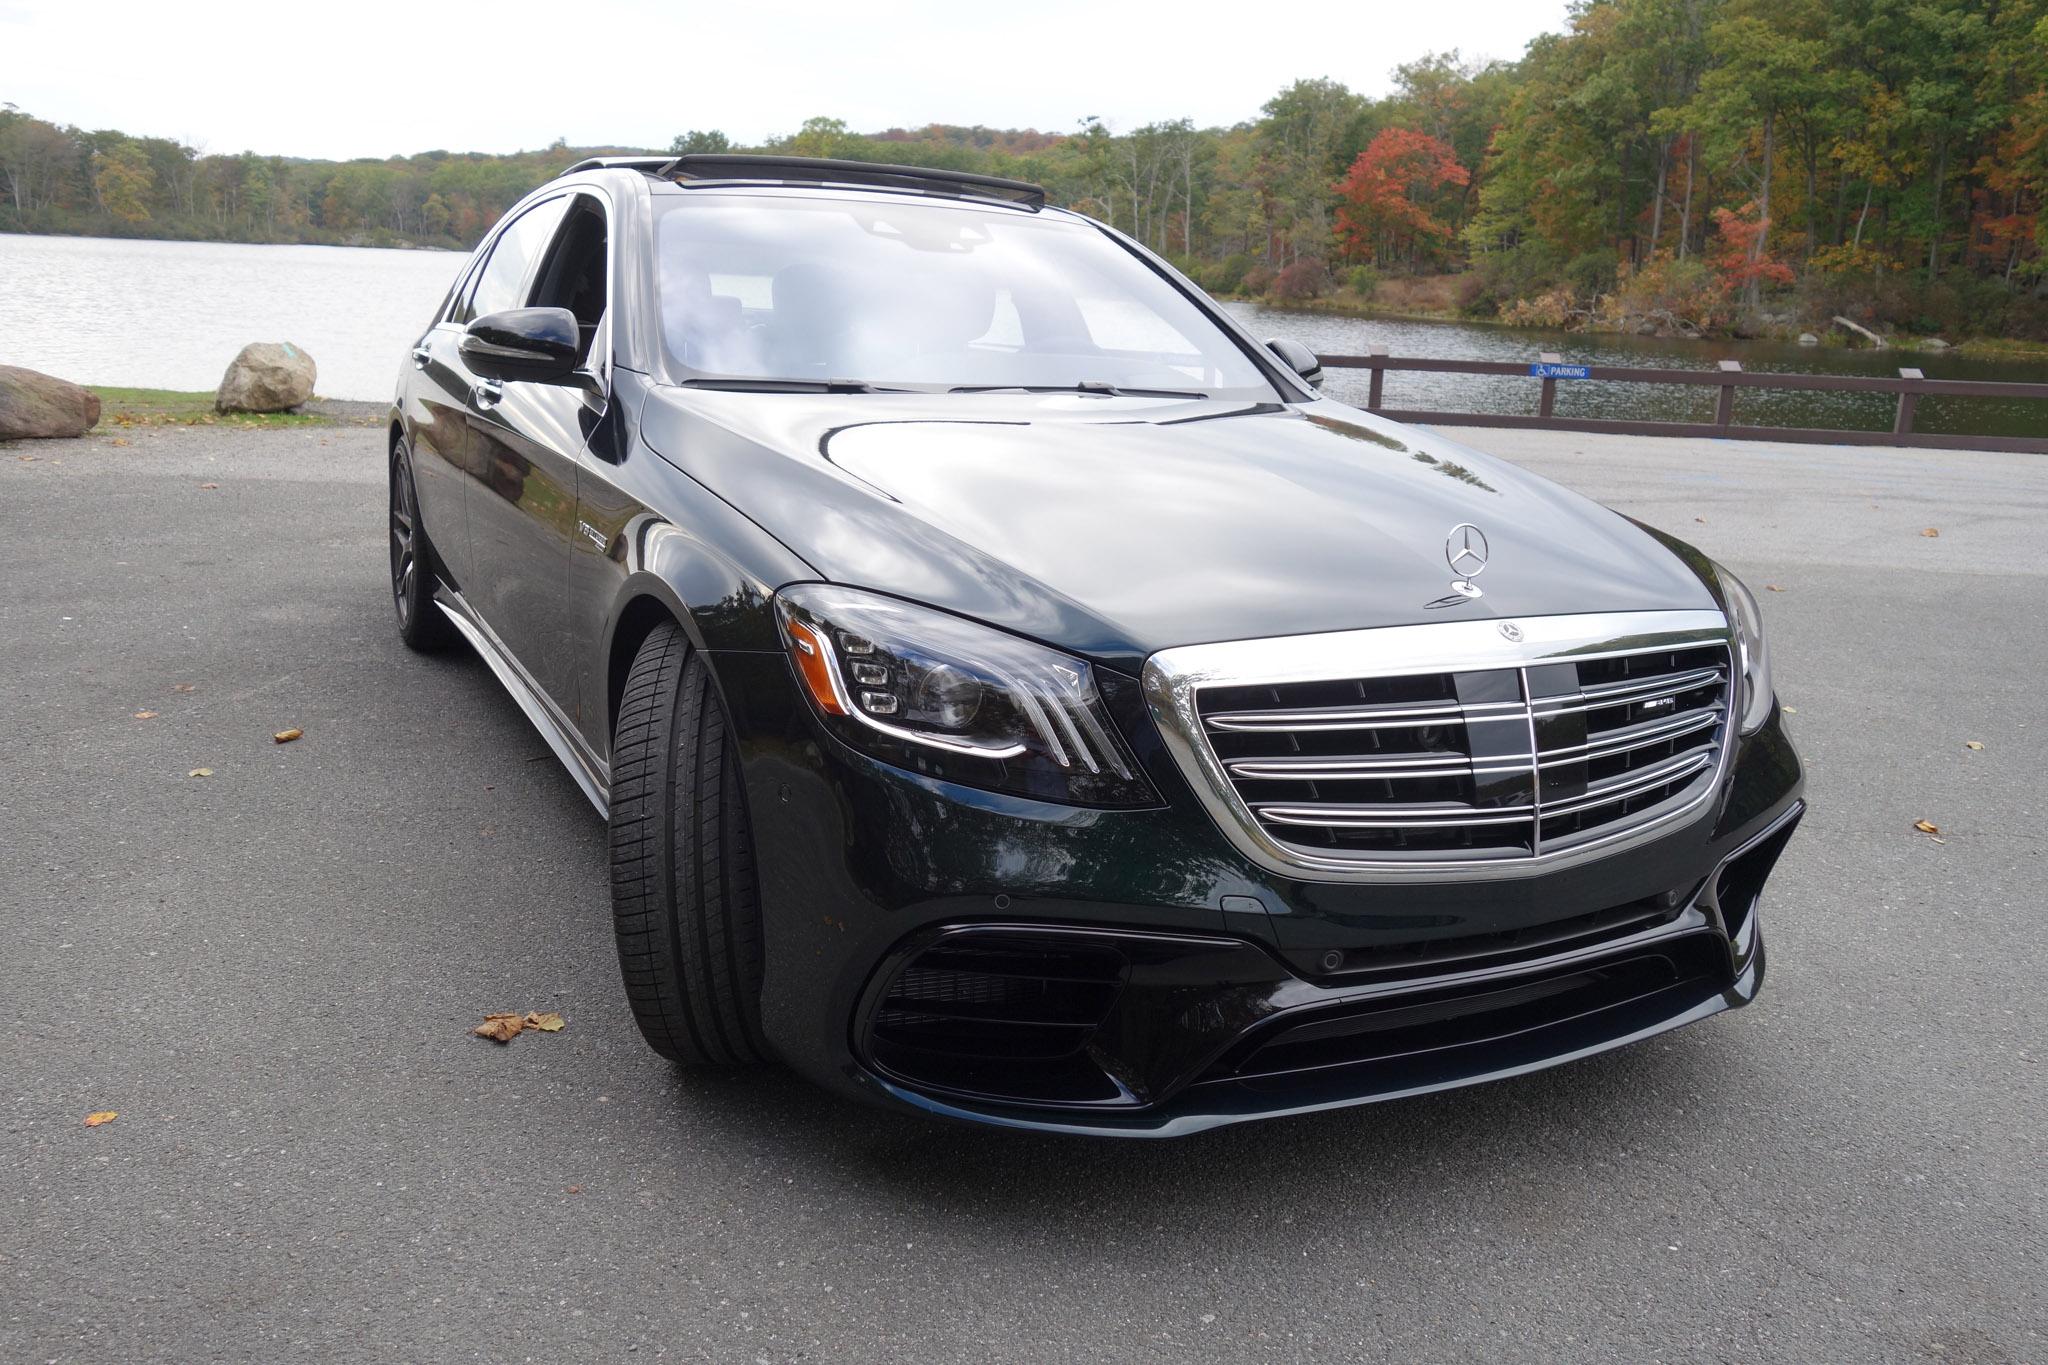 https://st.automobilemag.com/uploads/sites/11/2017/10/2018-Mercedes-AMG-S63-Bear-Mountain.jpg